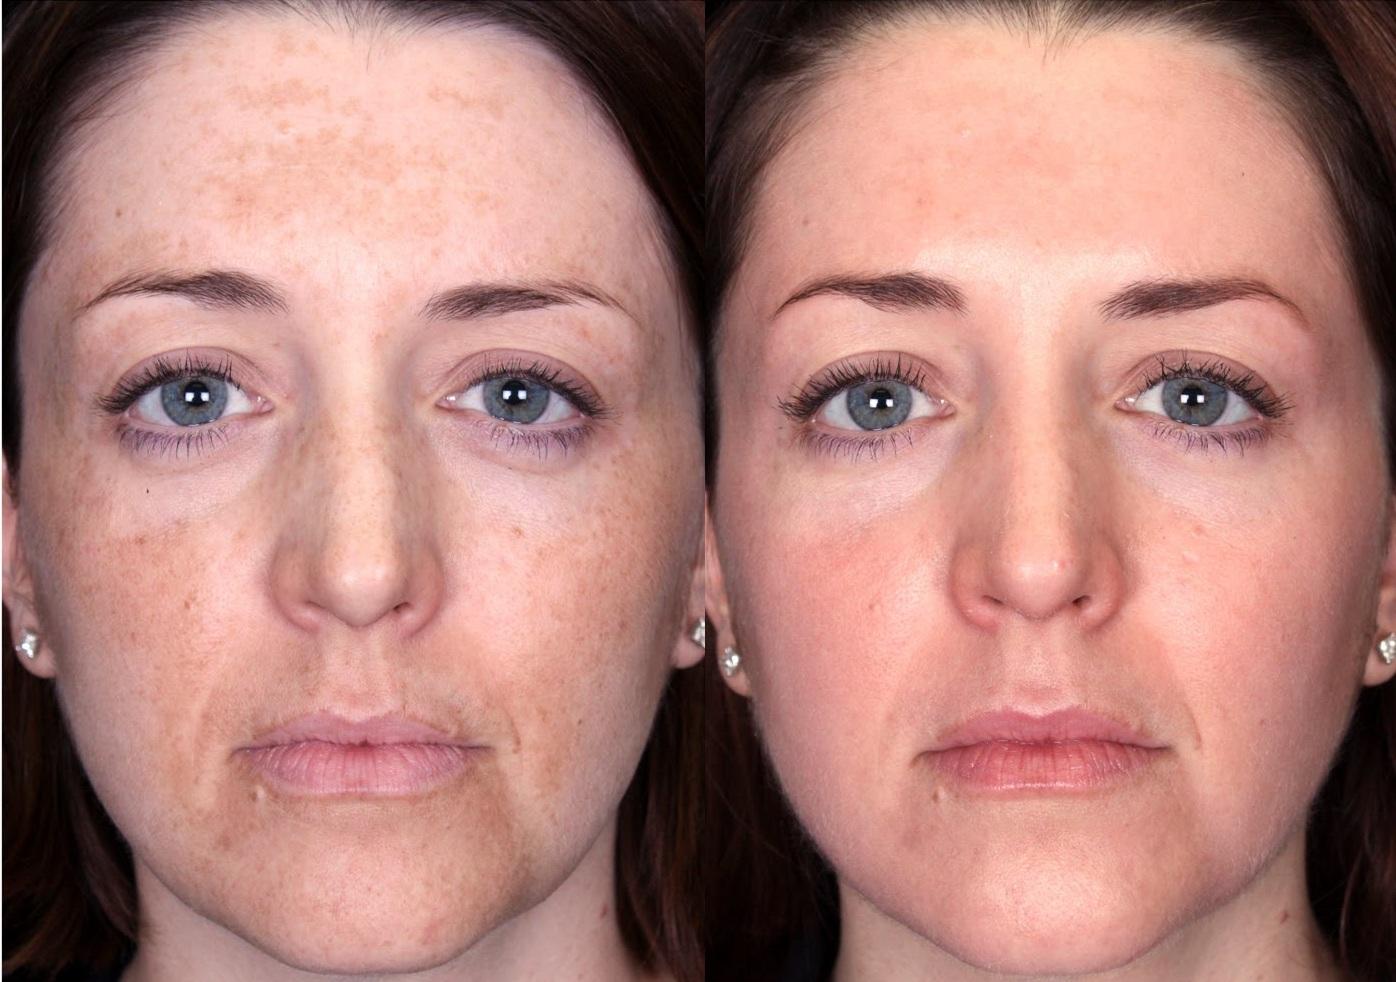 лицо после пилинга фото до и после